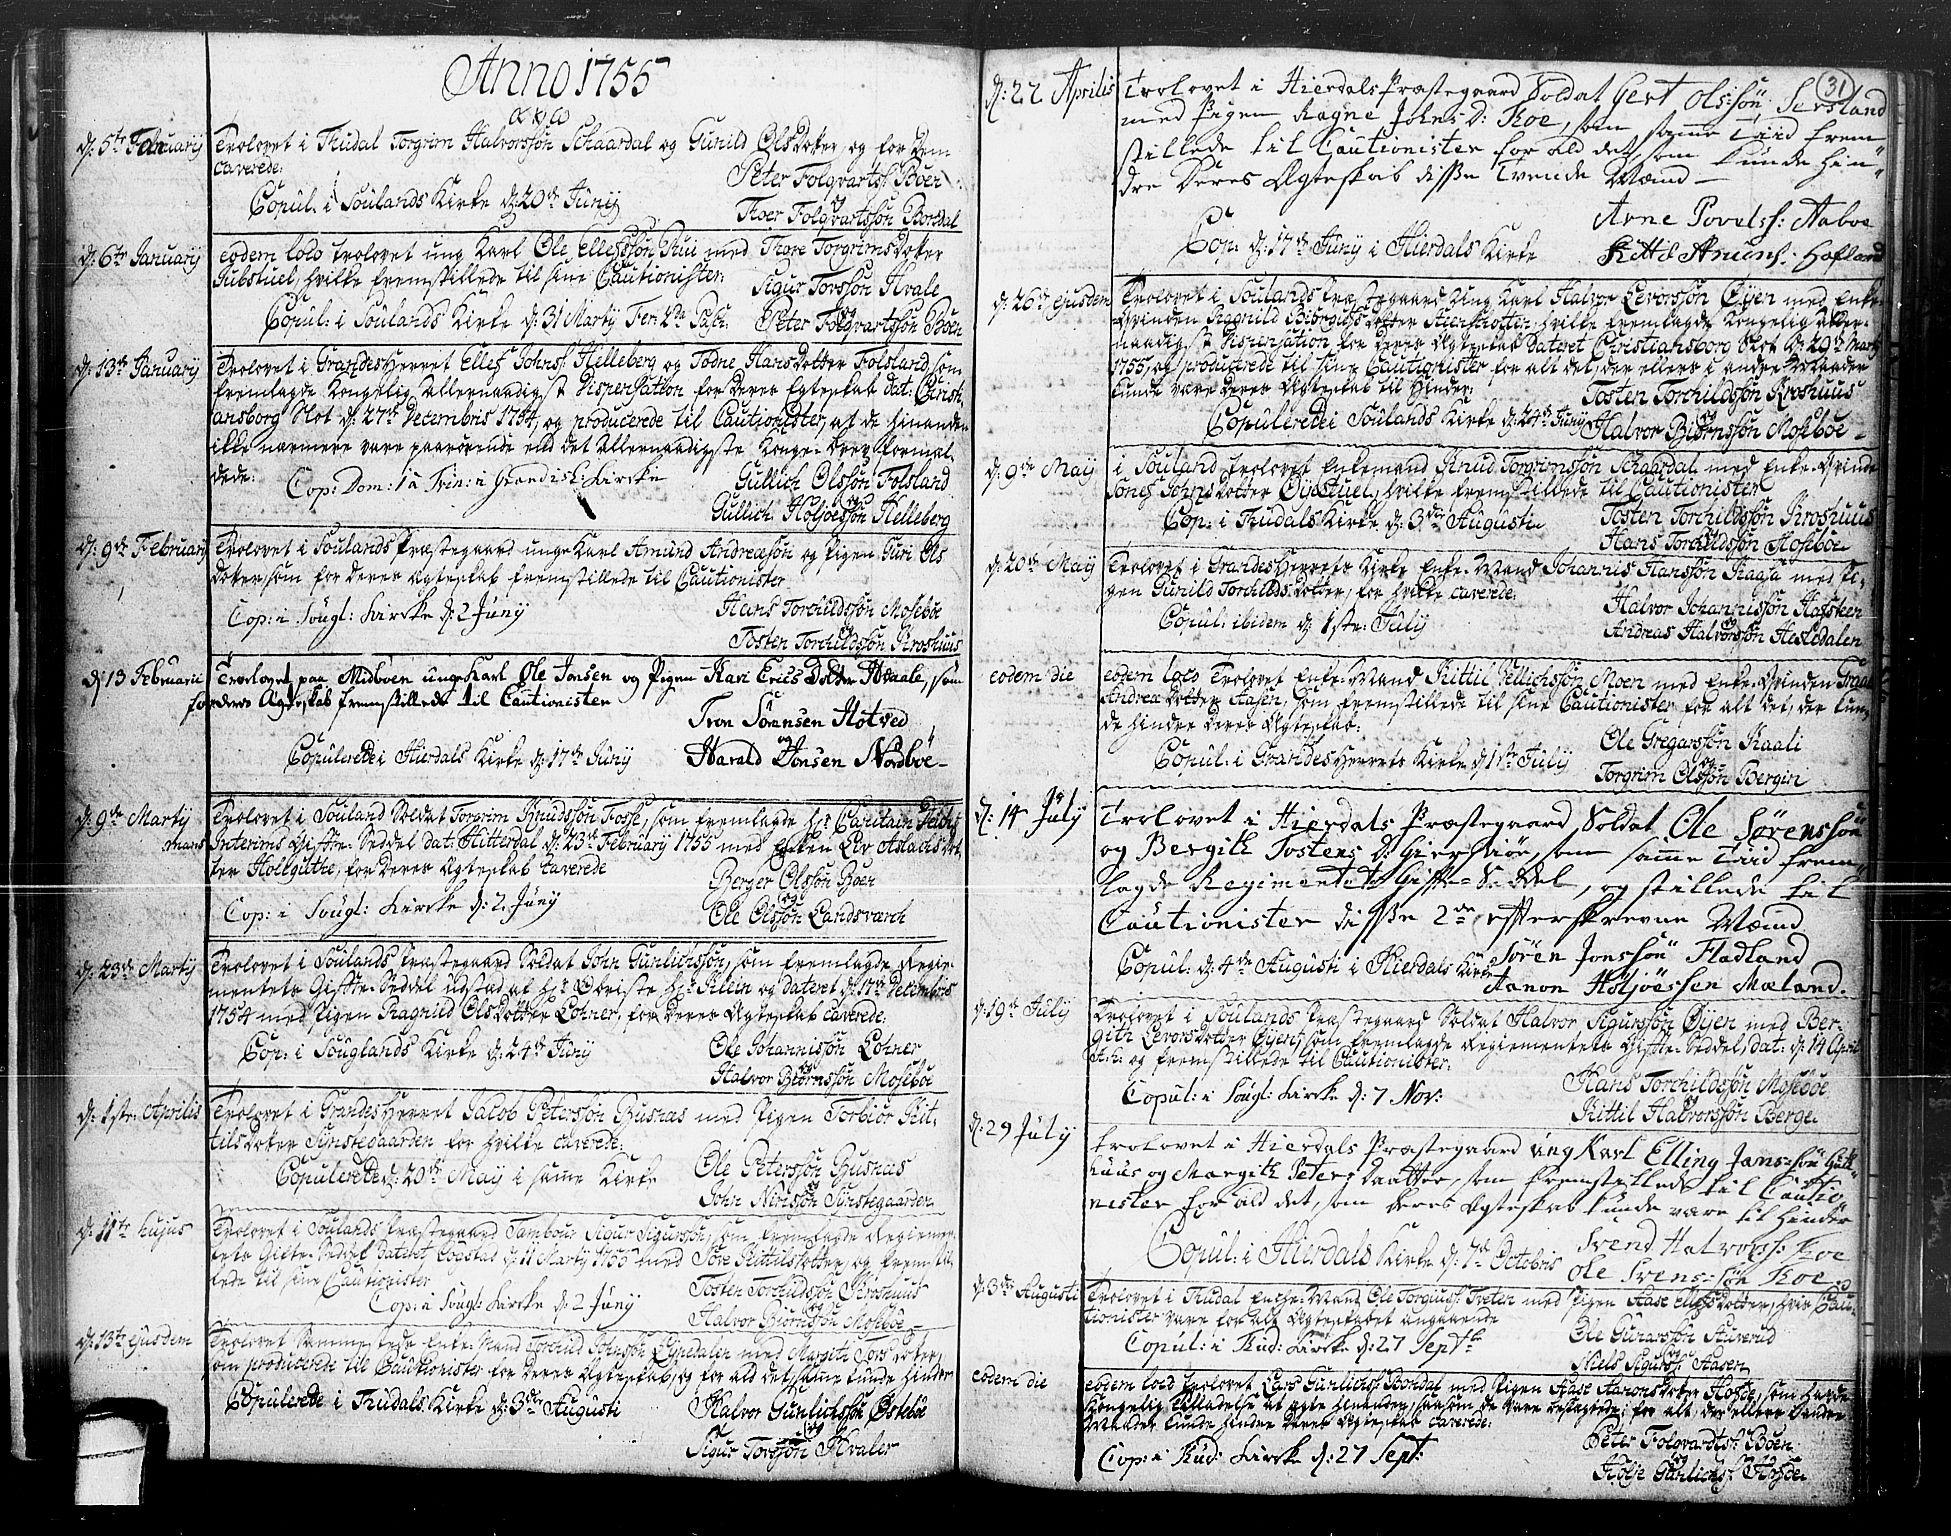 SAKO, Hjartdal kirkebøker, F/Fa/L0004: Ministerialbok nr. I 4, 1727-1795, s. 31